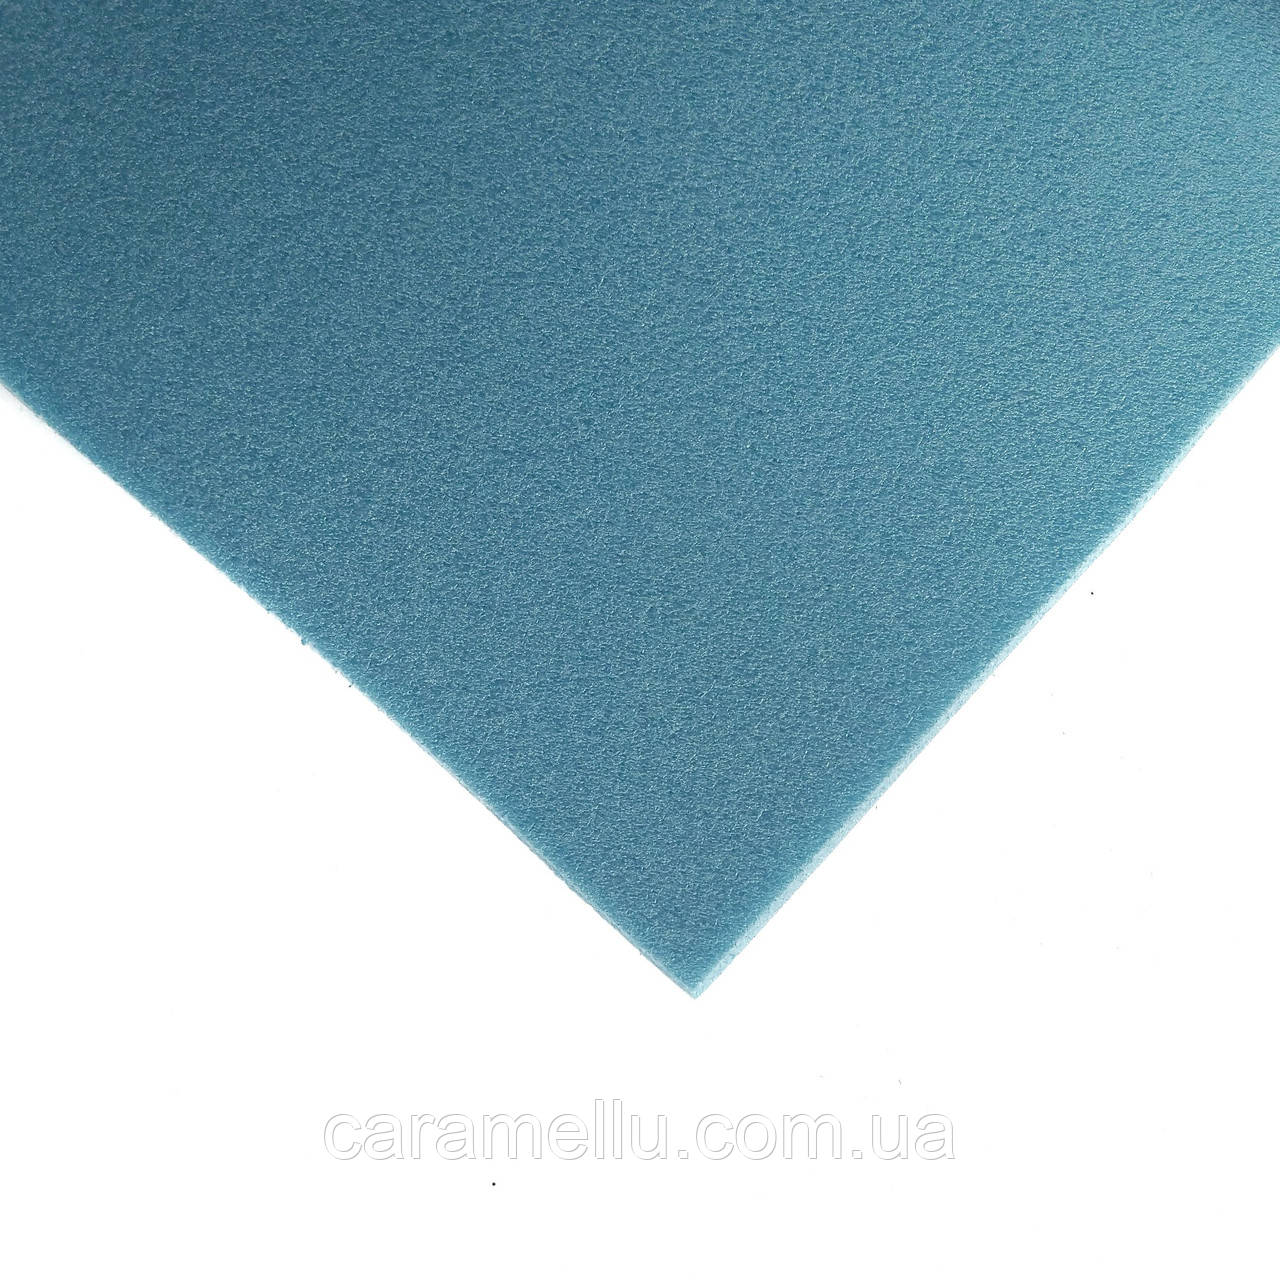 Изолон 2мм. 25*50 см. Серо-синий